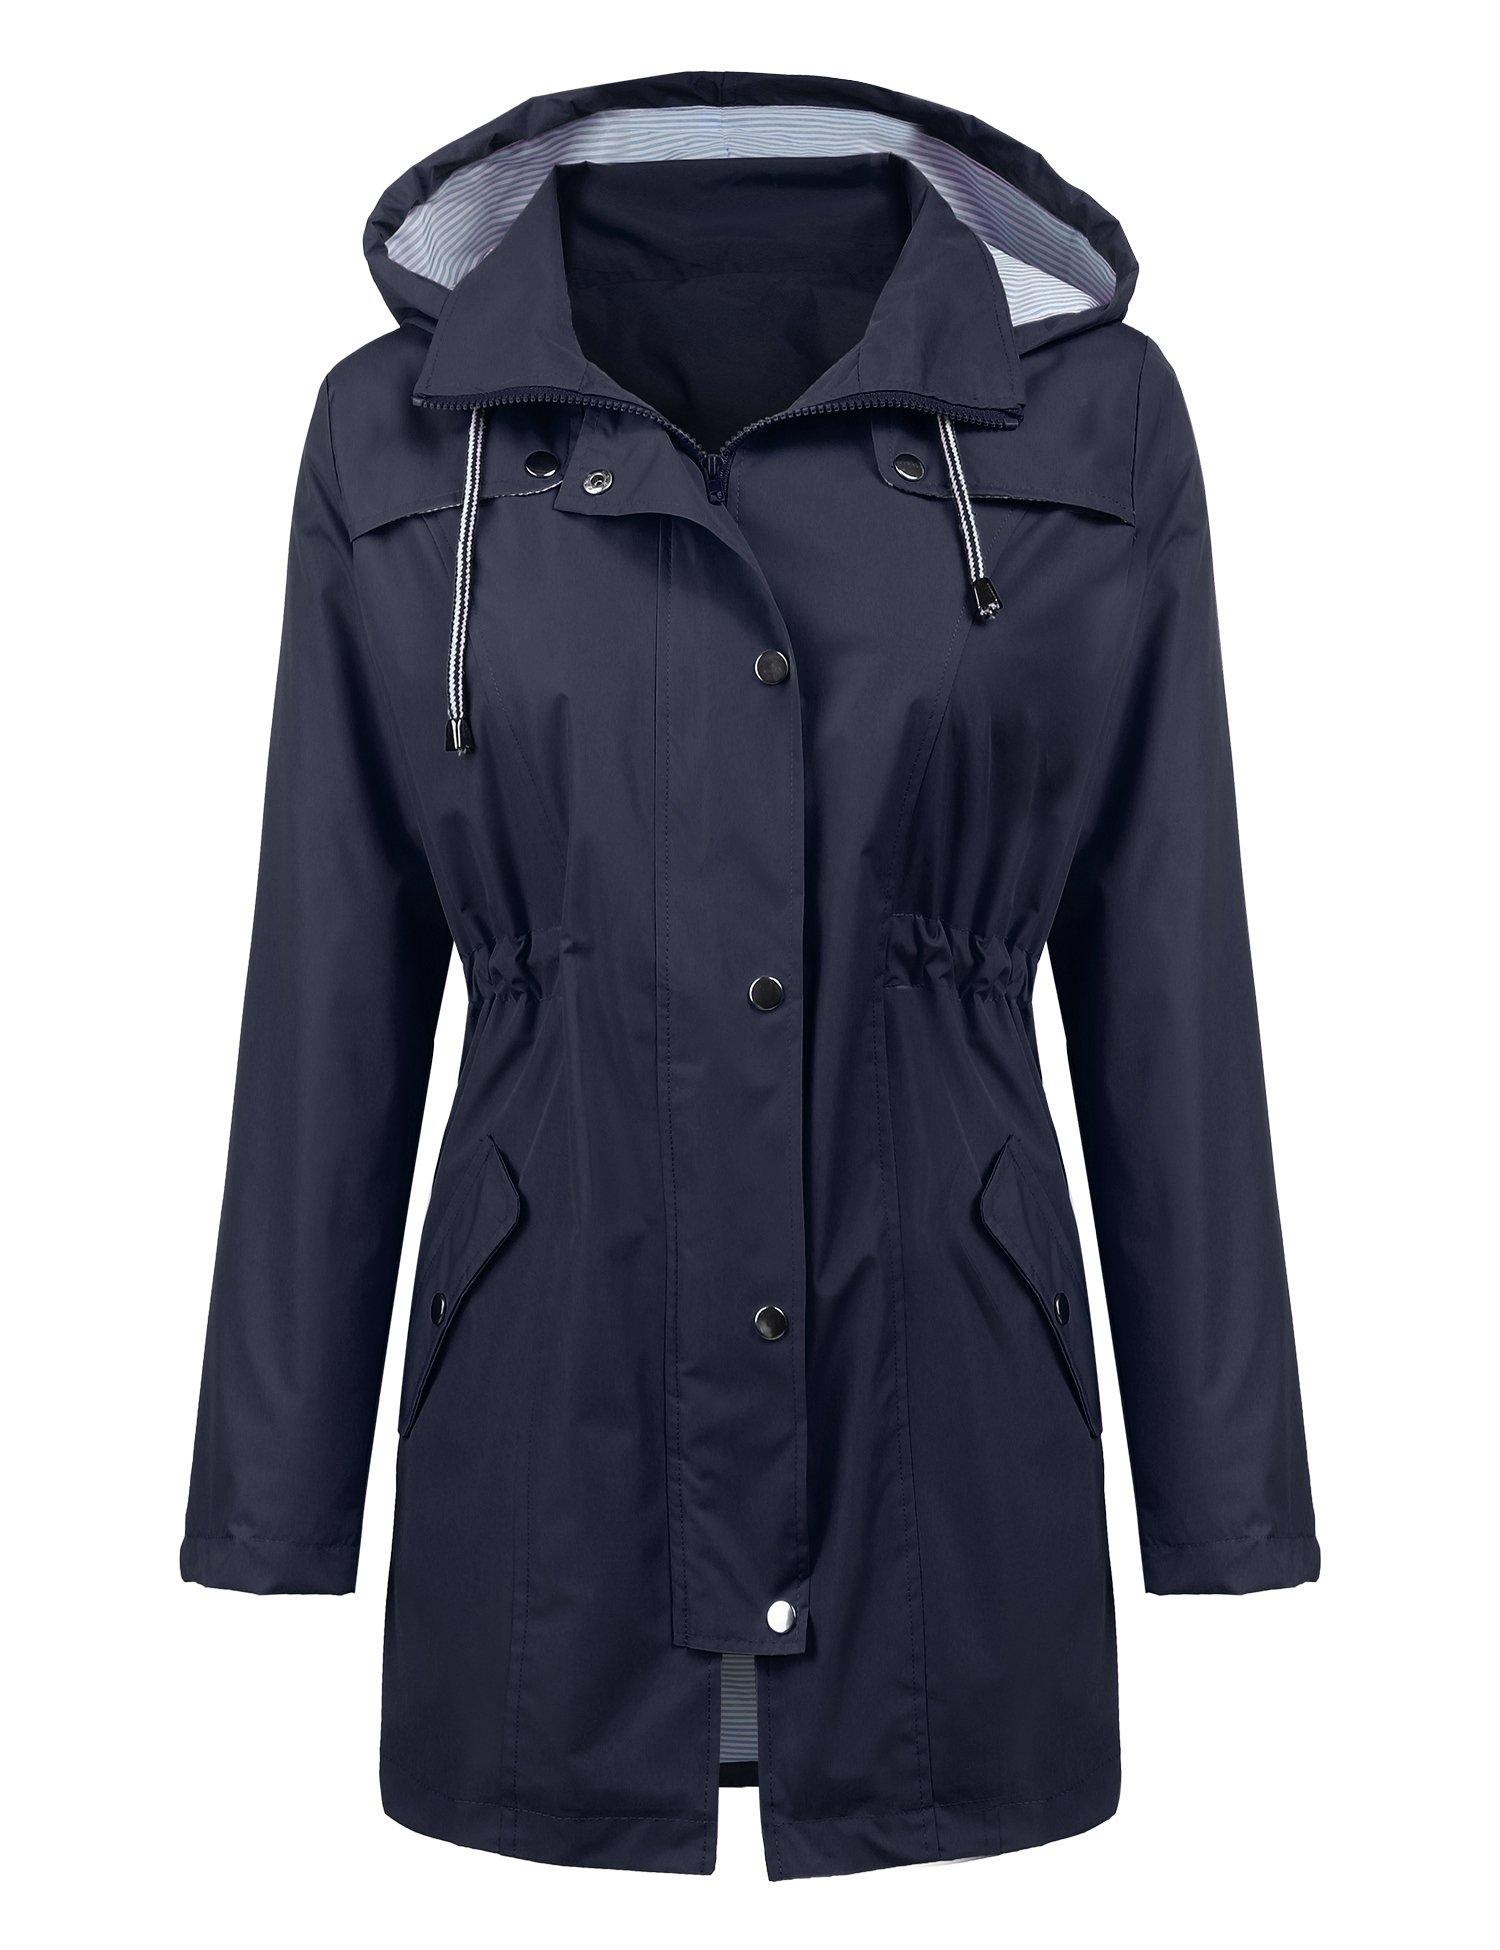 ZHENWEI Womens Lightweight Hooded Waterproof Active Outdoor Rain Jacket S-XXL (XS, Navy Blue) by ZHENWEI (Image #2)